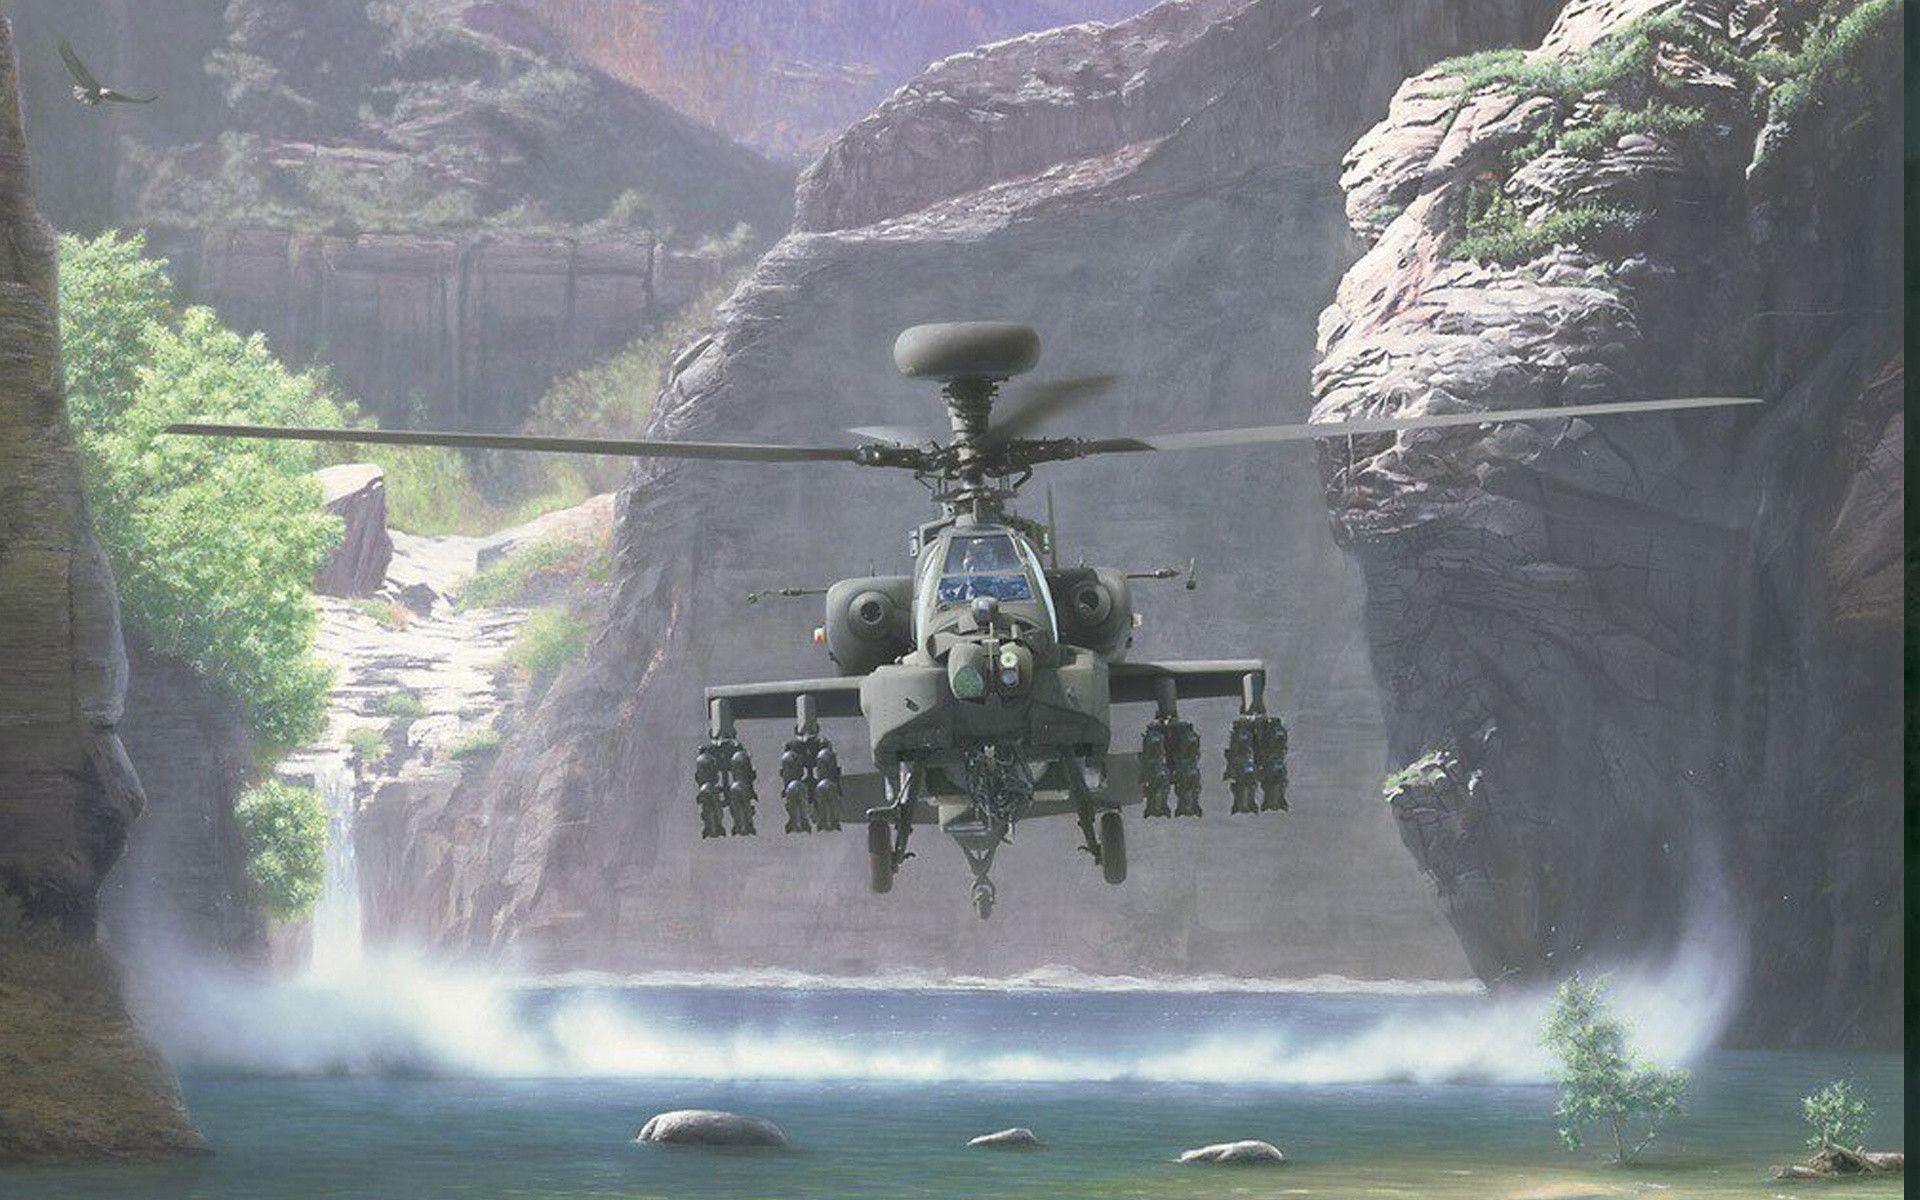 helicopter wallpaper hd desktop - photo #31